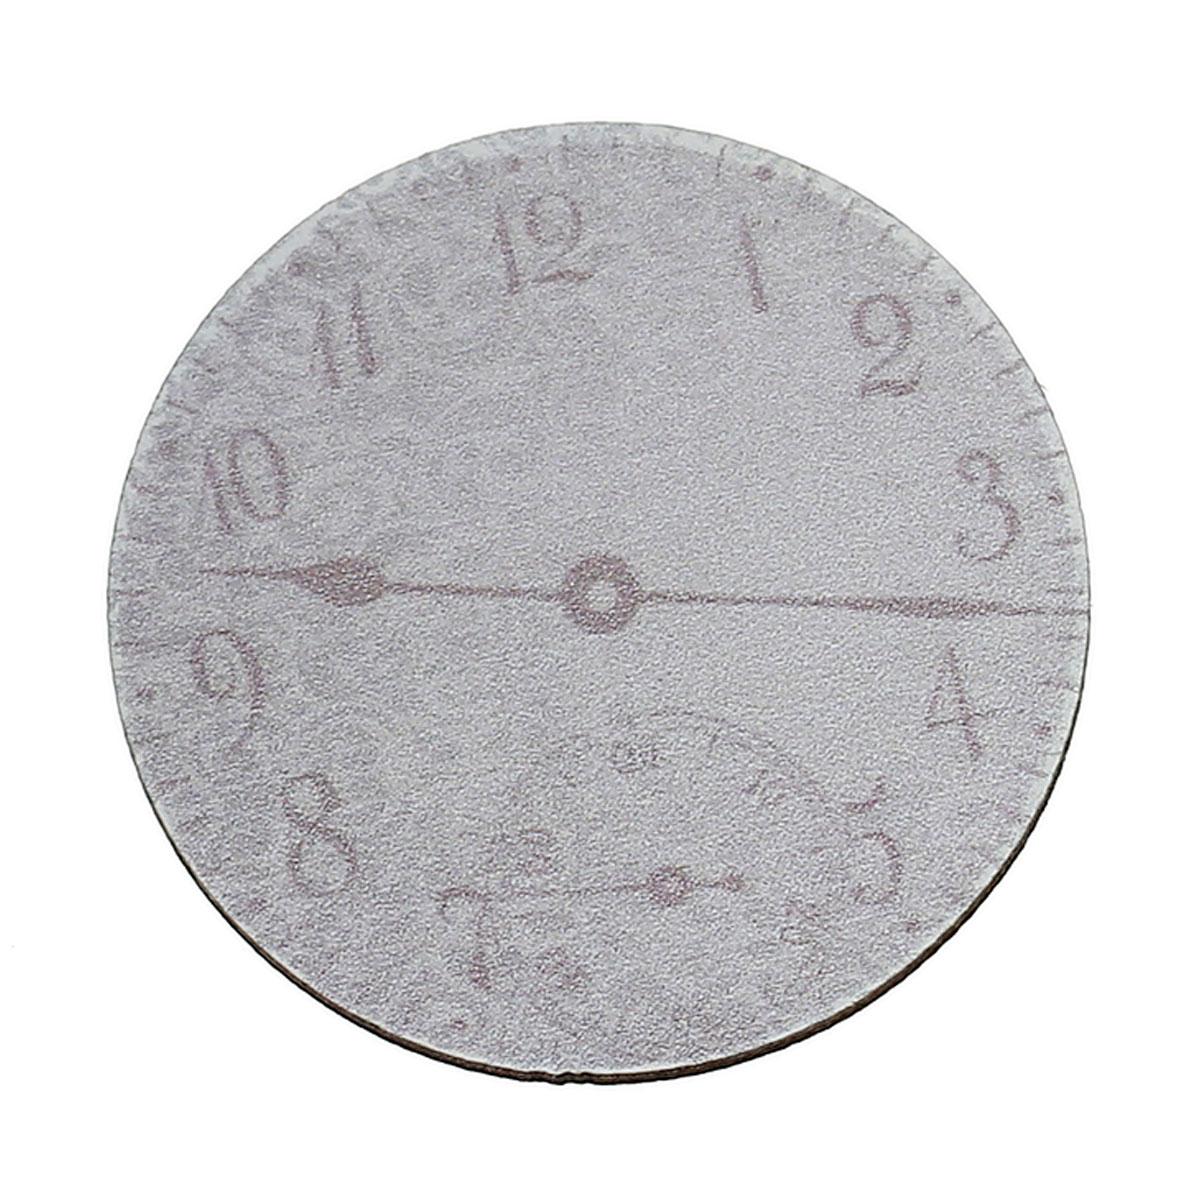 Wood Cabochons Scrapbooking Embellishments Findings Round Gray Clock Pattern 3.8cm(1 4/8)Dia,30 PCs new